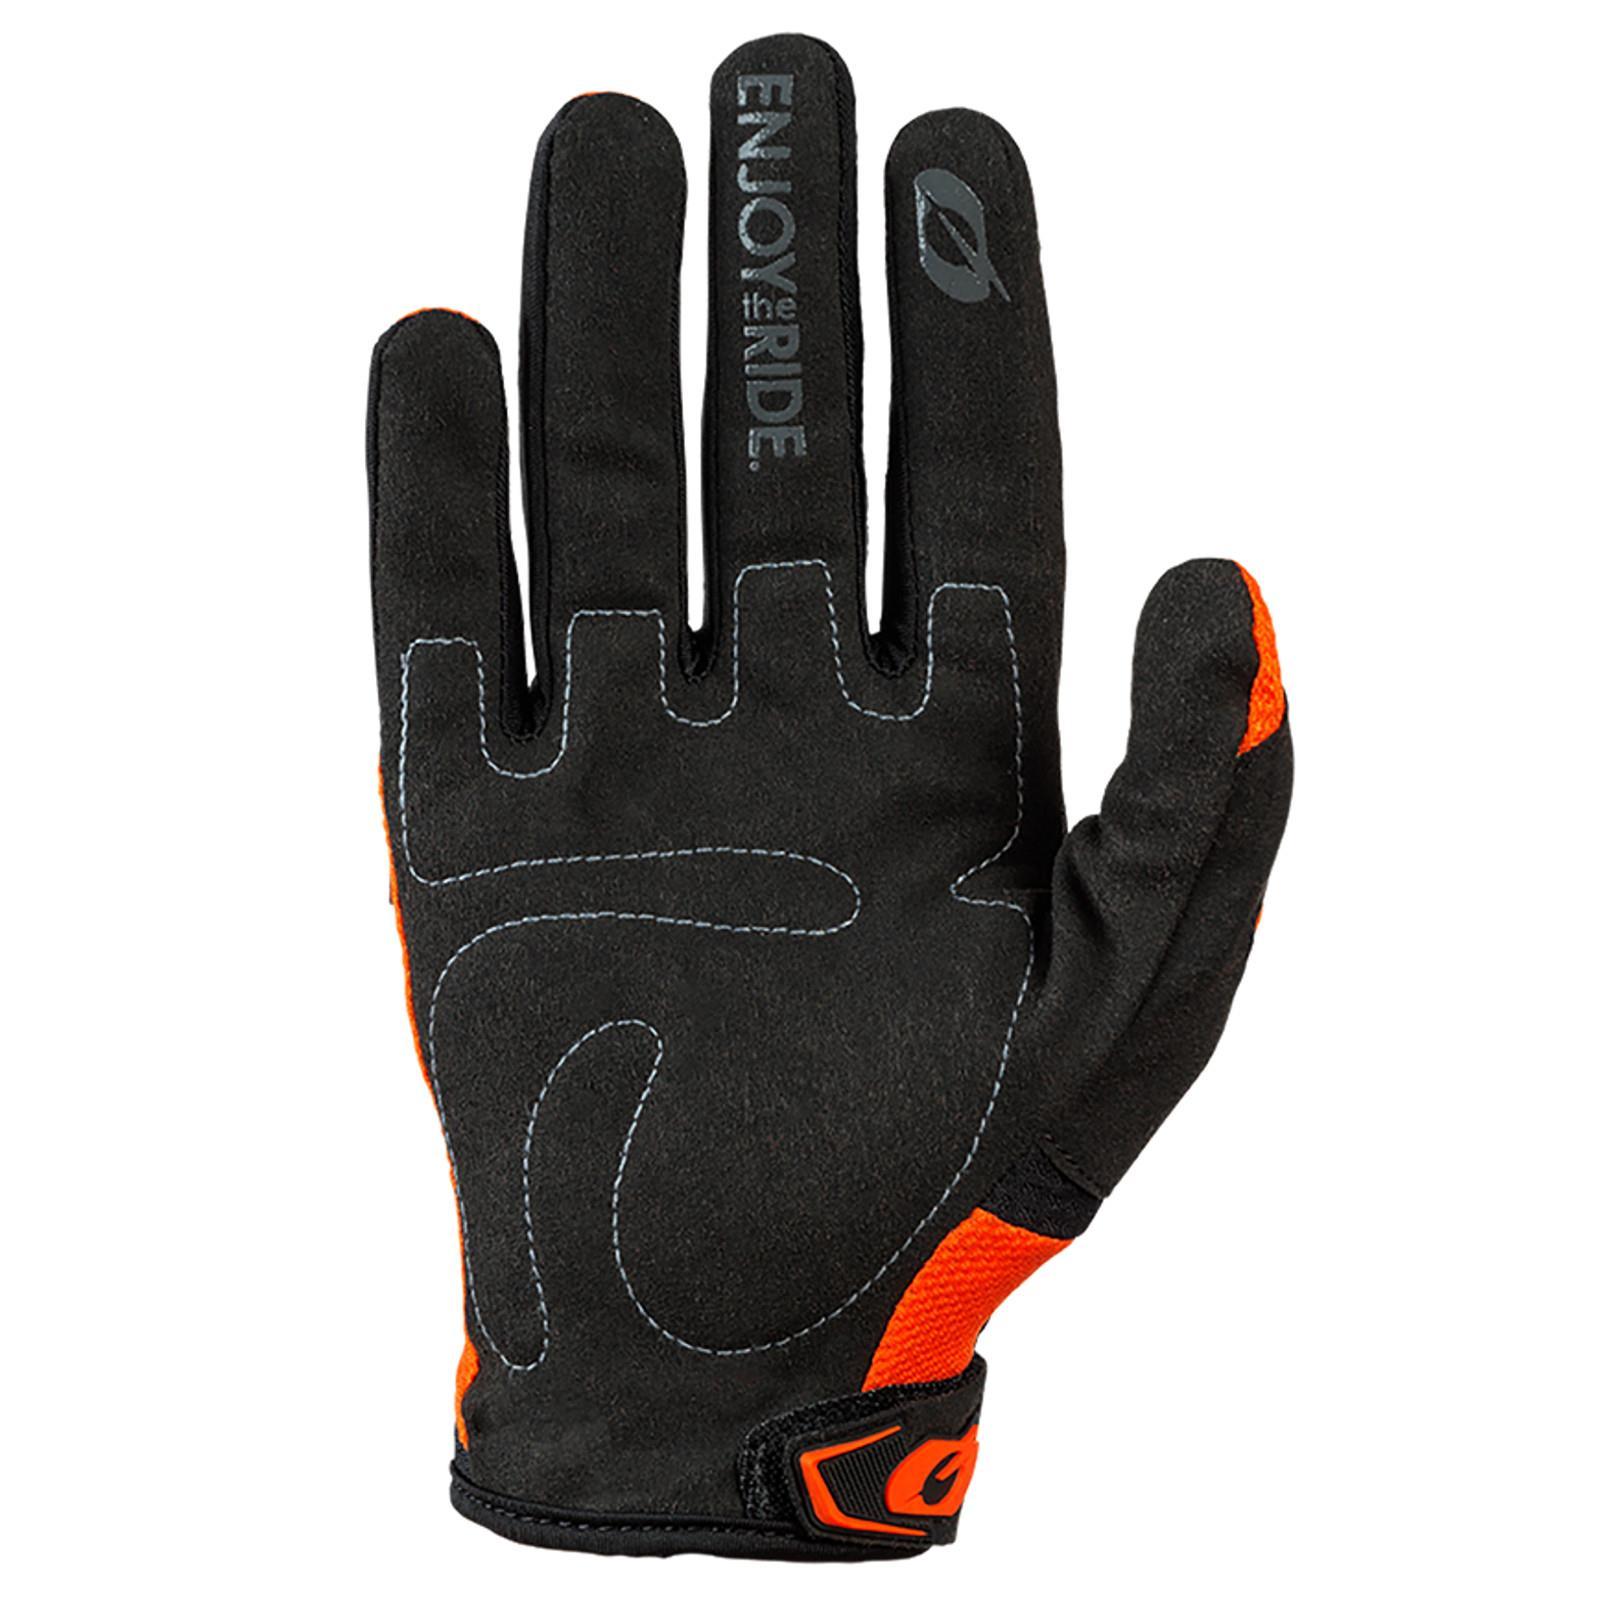 Indexbild 16 - O'Neal Herren Handschuhe Element Motocross Mountainbike Downhill Fahrrad MTB MX